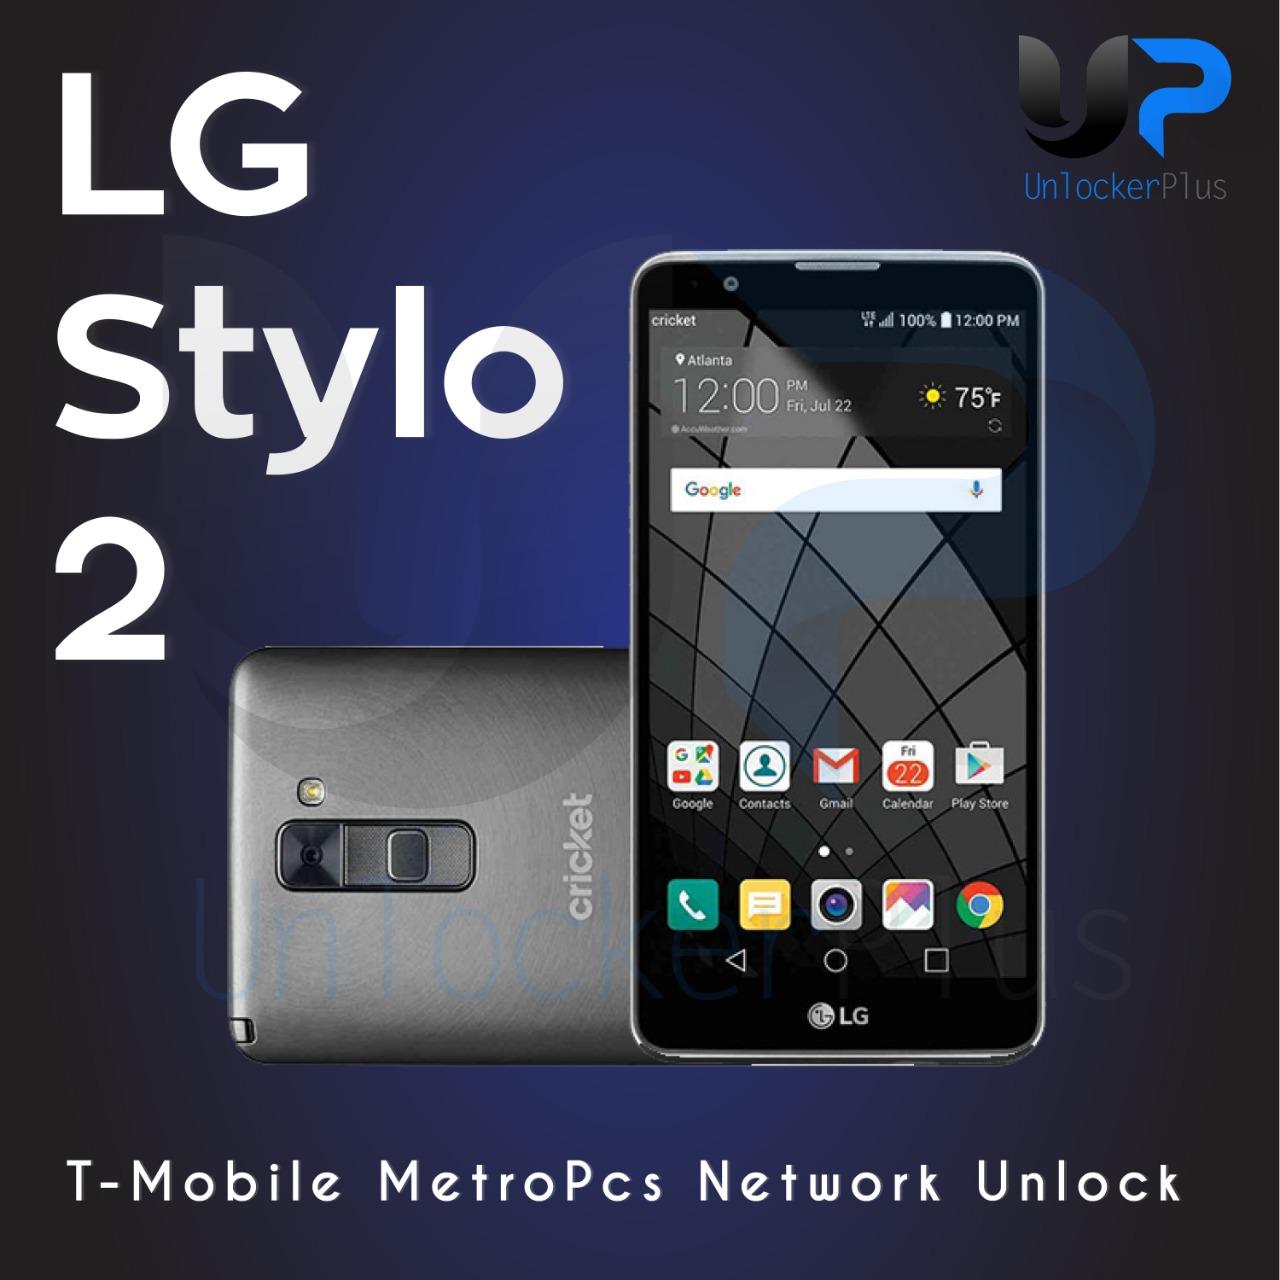 LG Stylo 2 Tmobile MetroPCS Network Unlock - UnlockerPlus | Welcome To  Possible